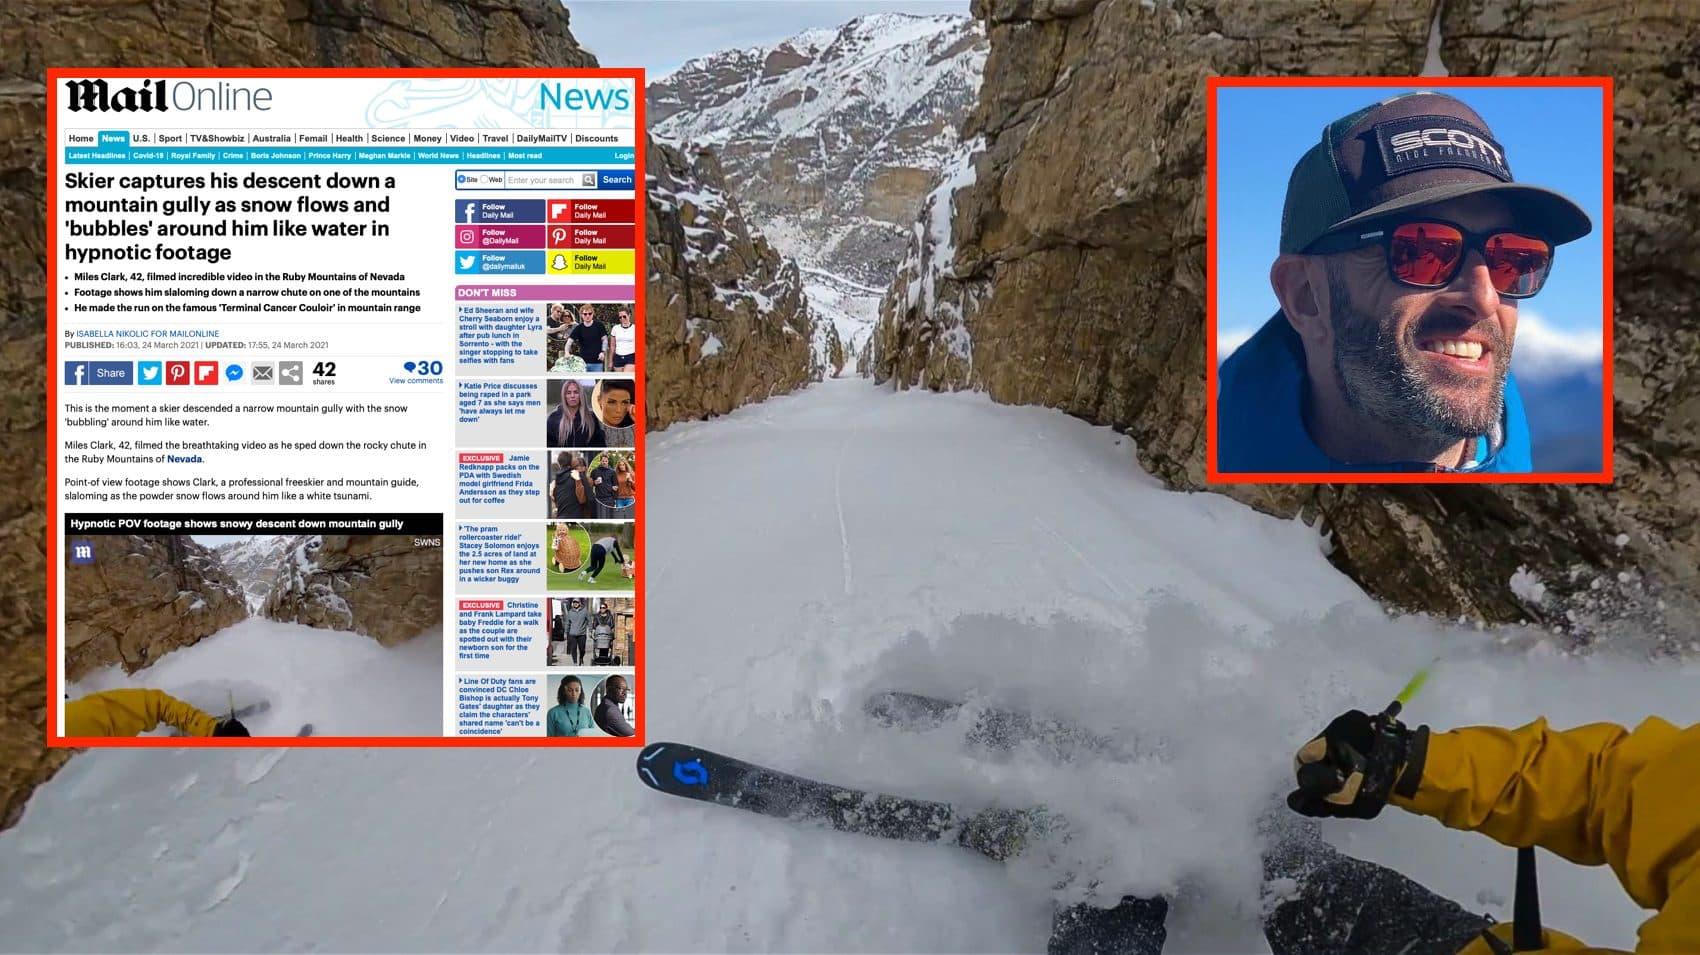 snowbrains, daily mail, mainline, Miles Clark, terminal cancer, couloir, ruby mountains, Nevada